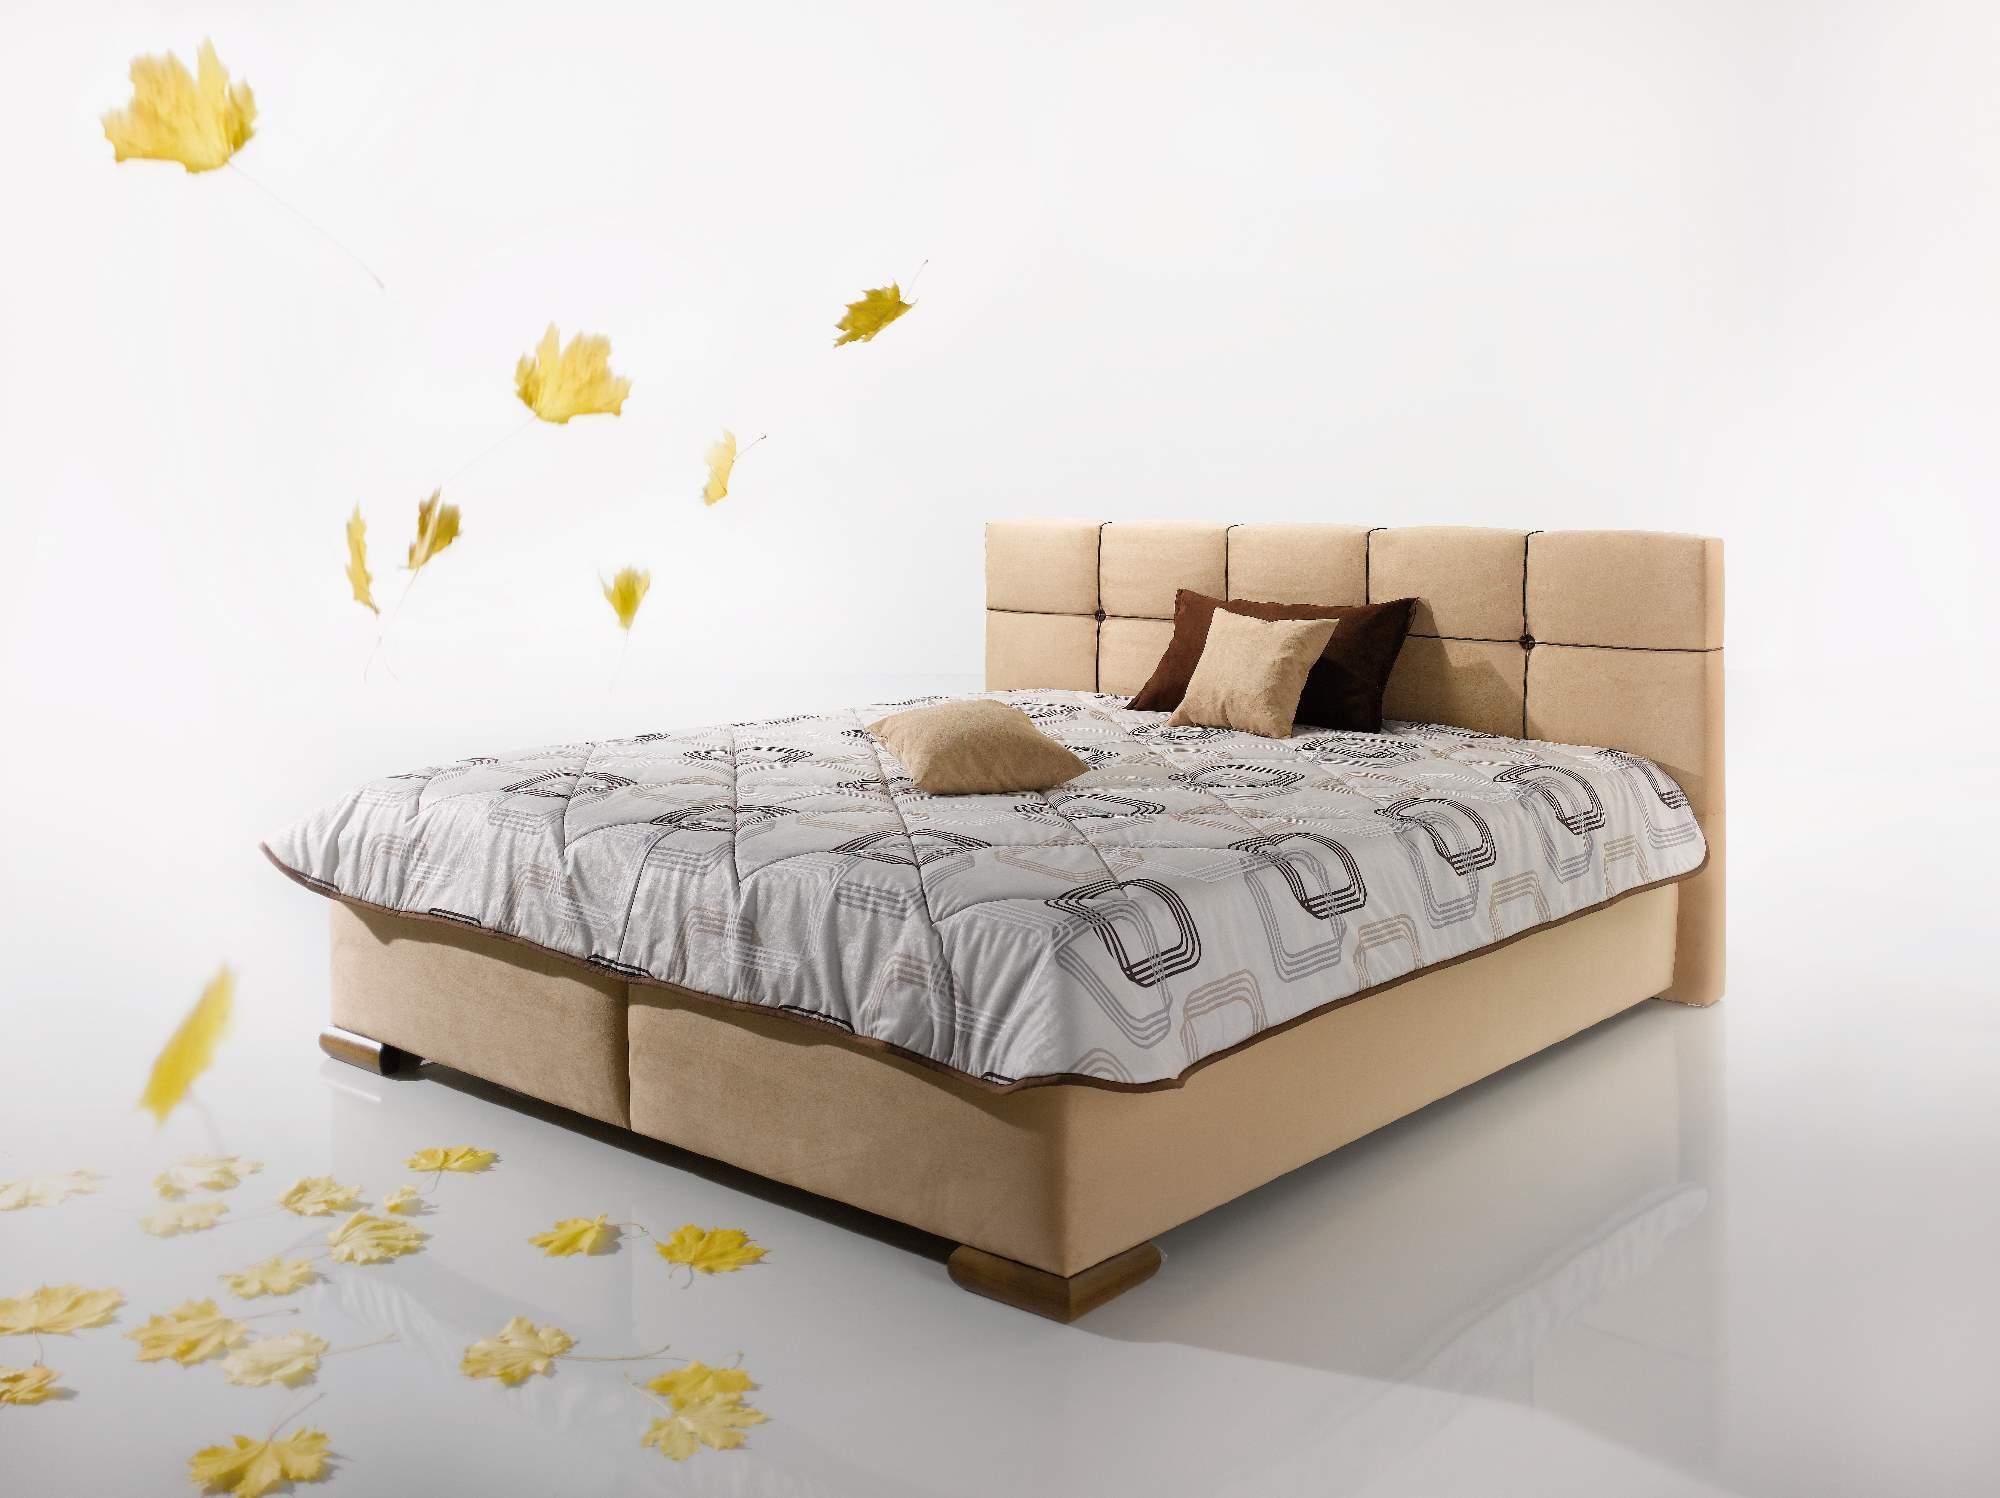 ArtND Manželská posteľ Lastra 160 Varianta: s roštom ND4 / s matracom BAZI